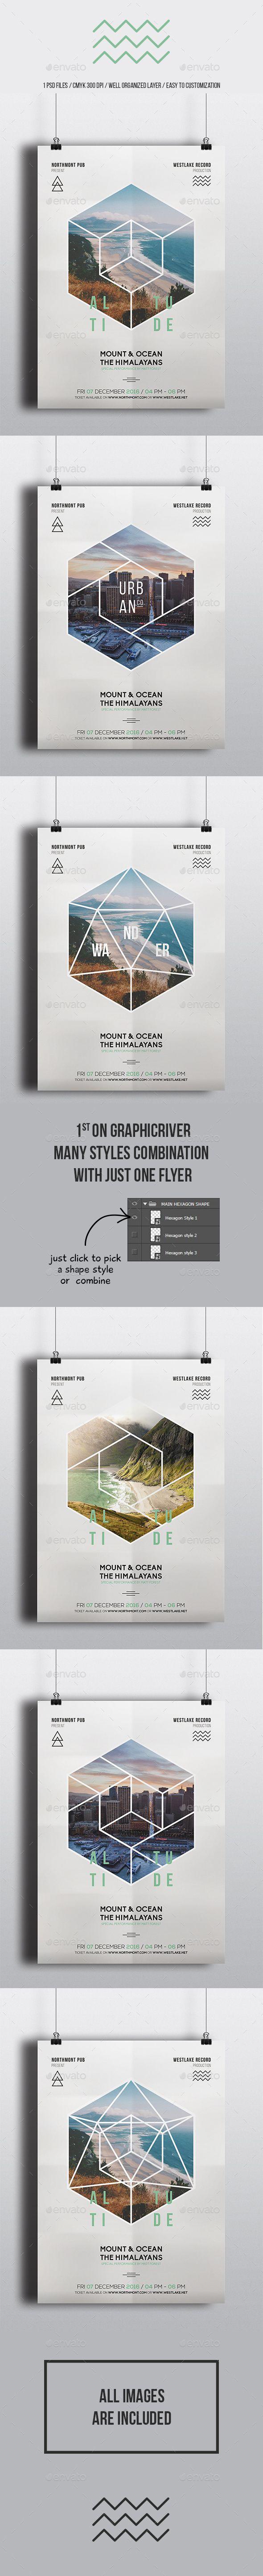 Geometric Gig Minimal Flyer — Photoshop PSD #geometric #alternative • Availa...